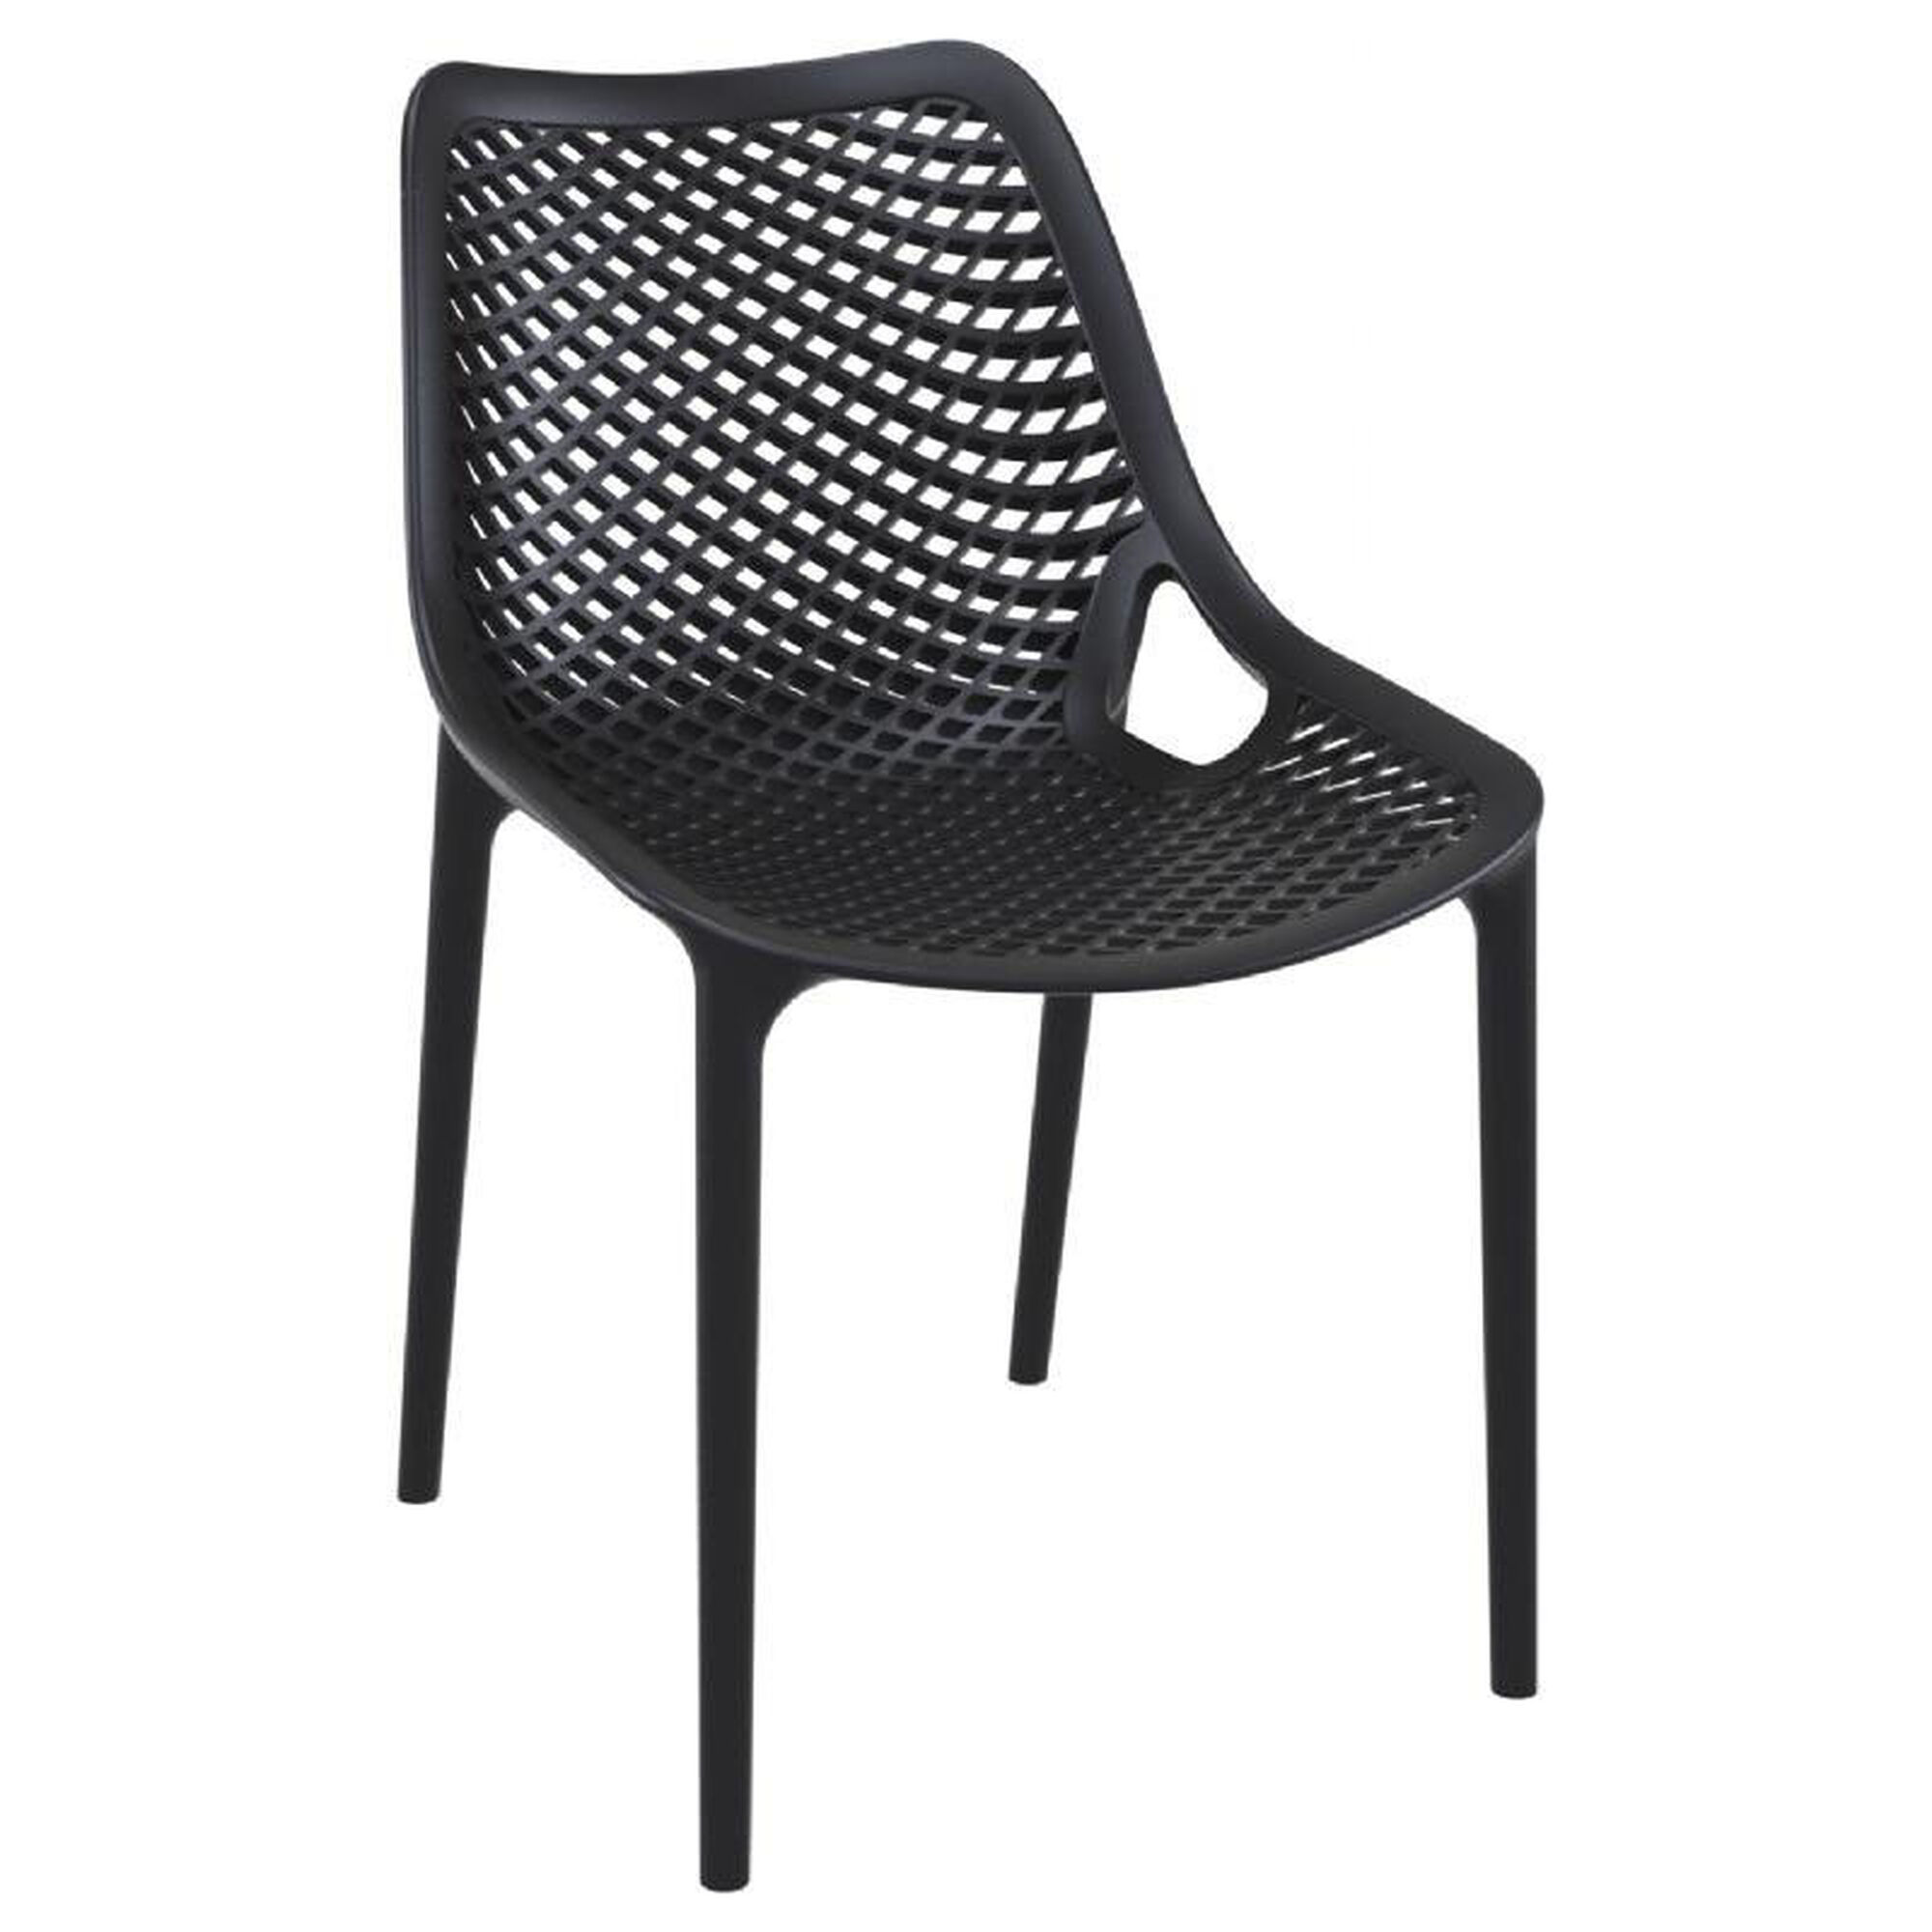 Black Resin Outdoor Dining Chair ISP014-BLA ...